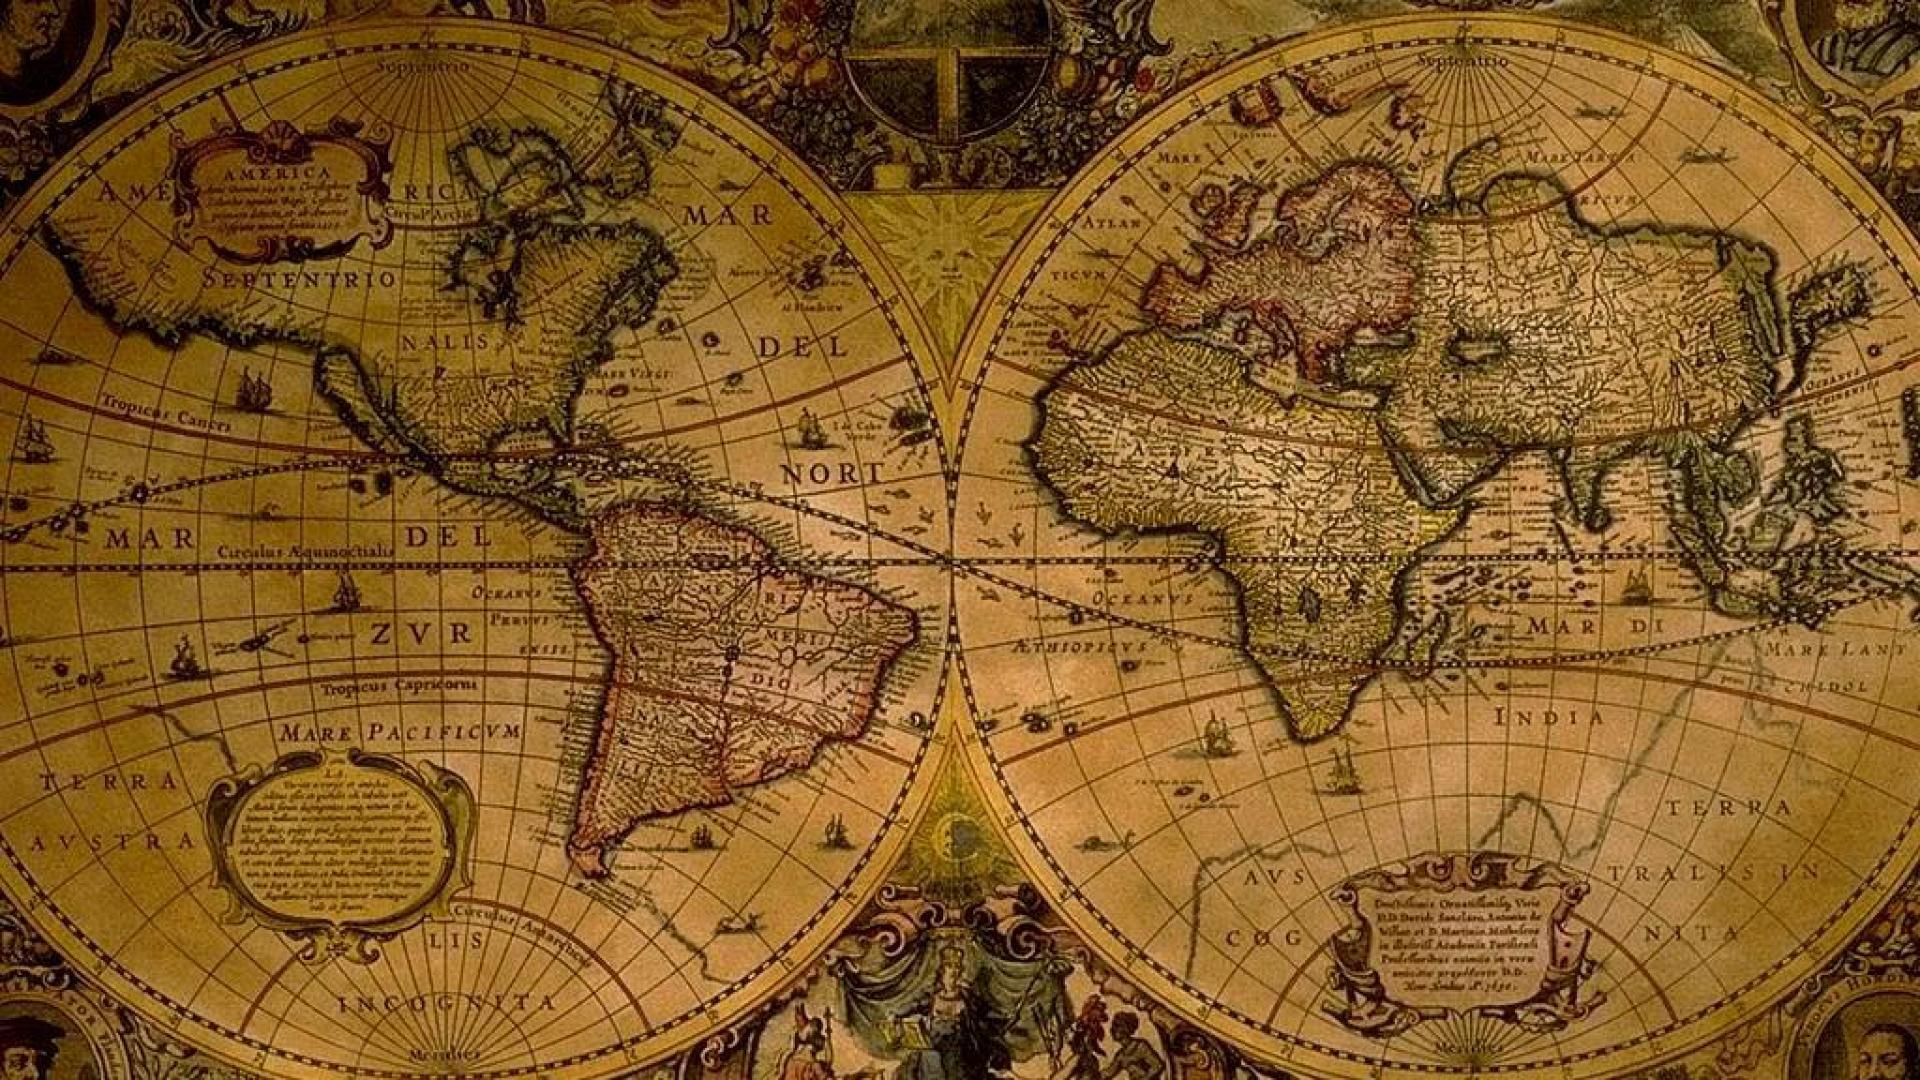 Download vintage map wallpaper HD [1920x1080]   71+ Vintage Map ...